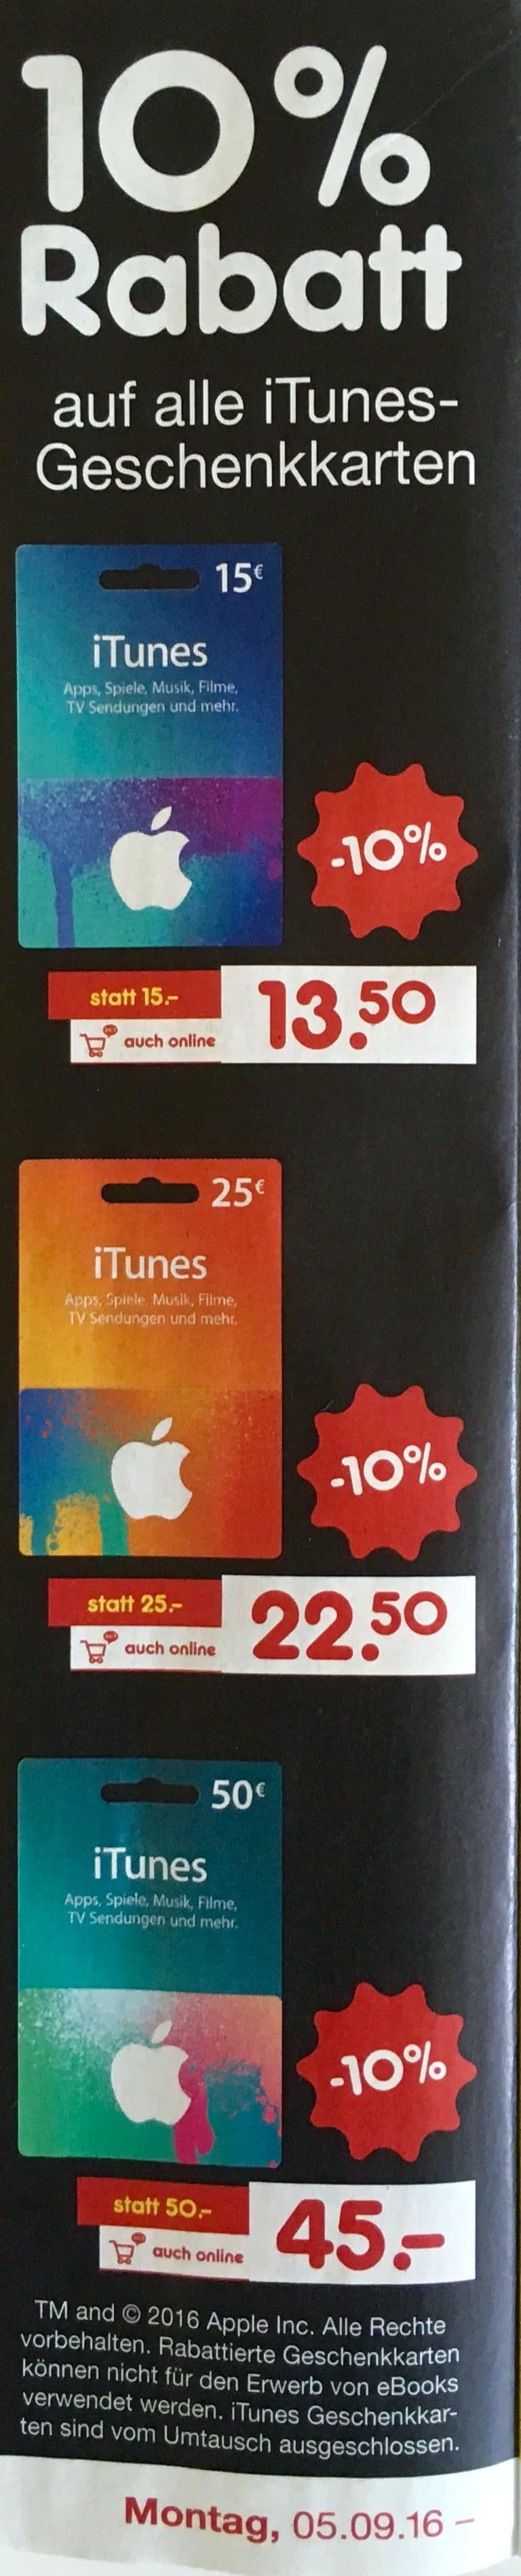 iTunes-Karten bei Netto